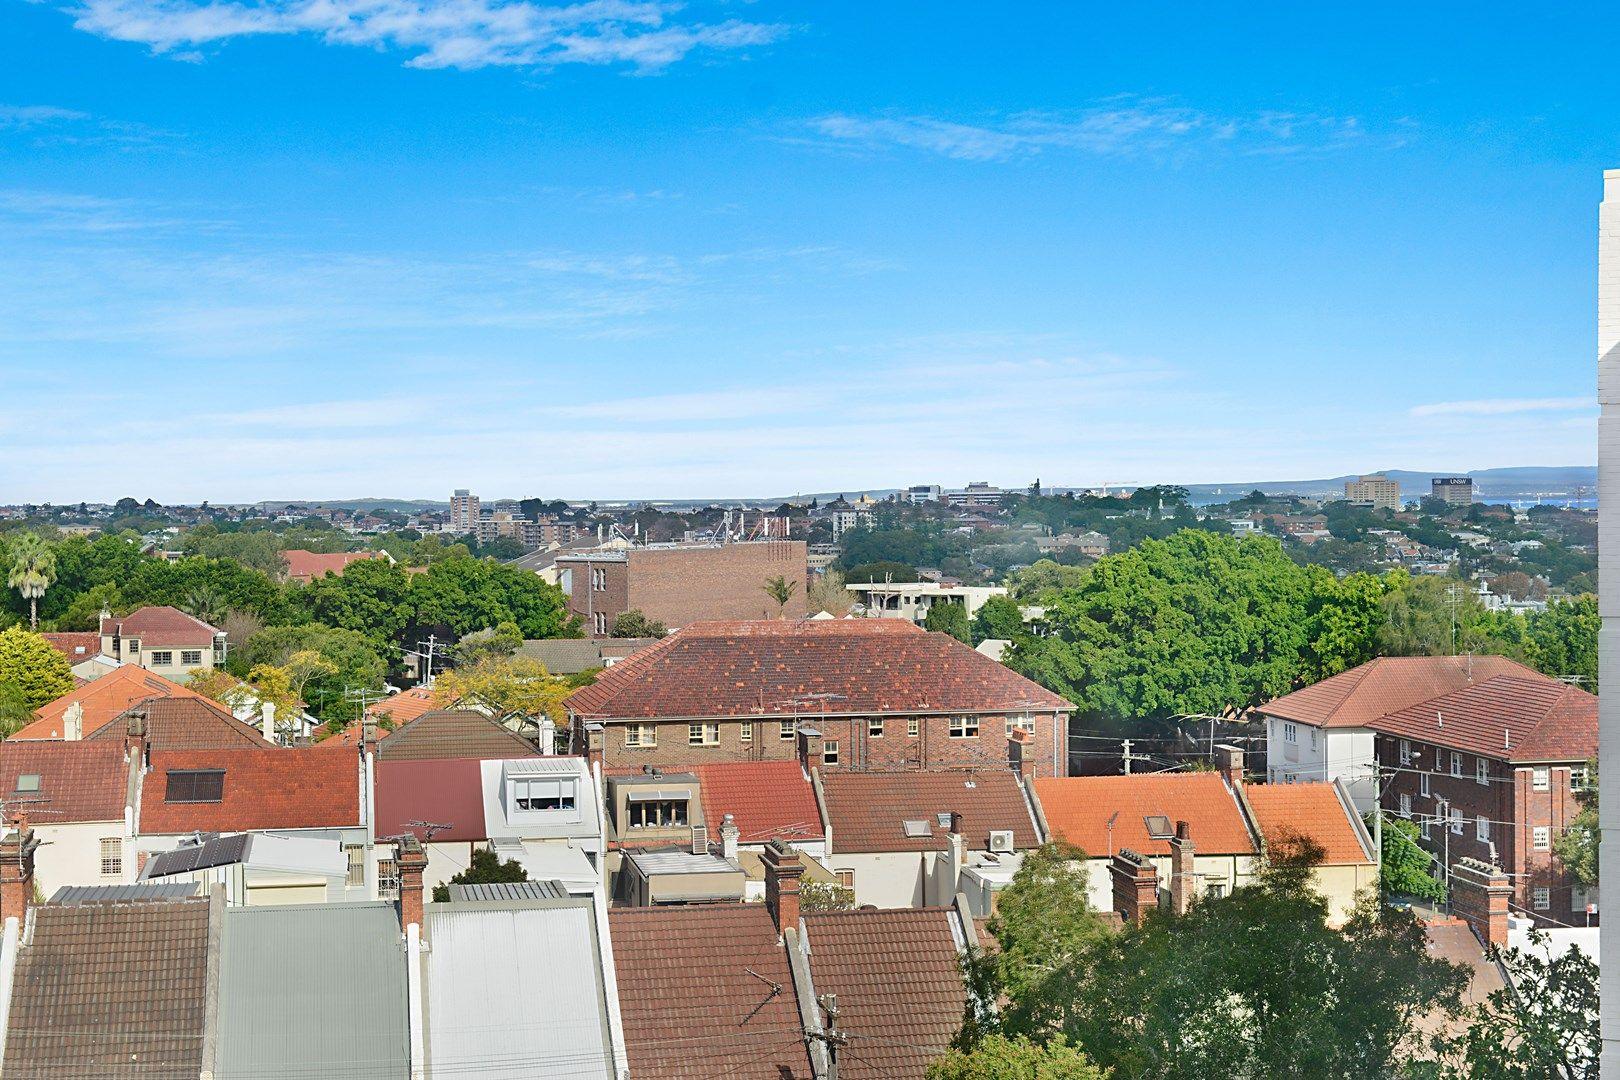 13/21-27 Waverley Street, Bondi Junction NSW 2022, Image 0